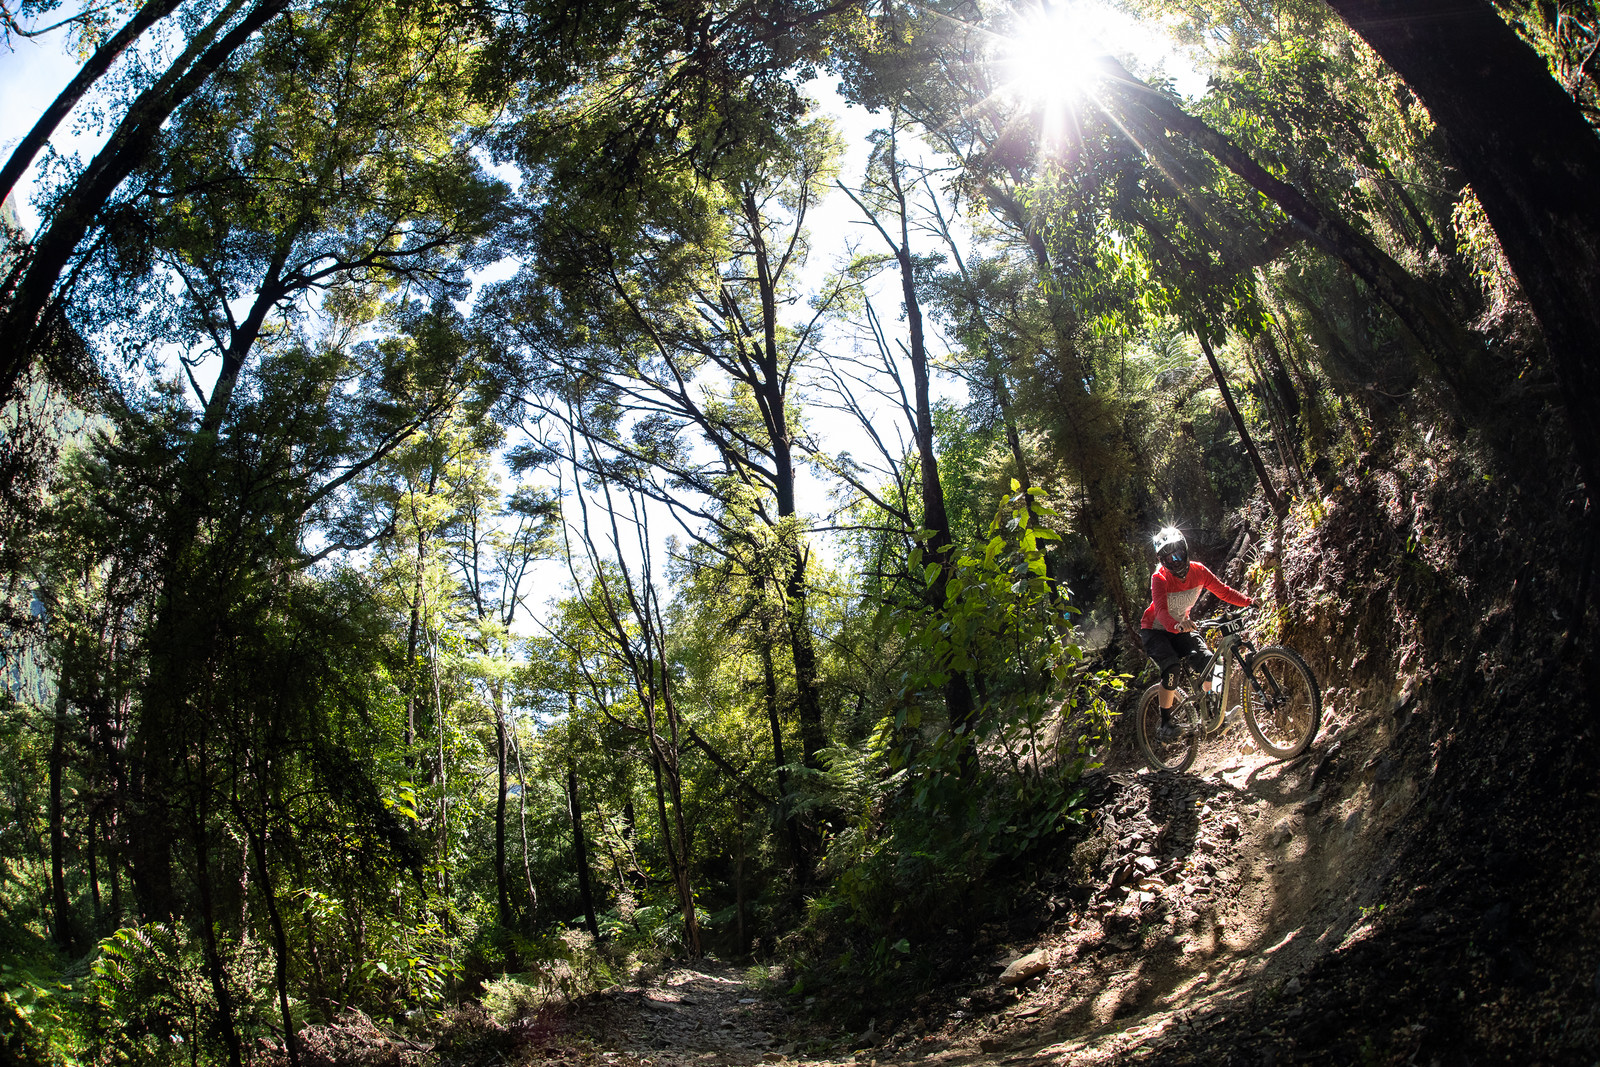 Charlotte Frost Switchin' Back - 2019 Dodzy Memorial Enduro - Mountain Biking Pictures - Vital MTB